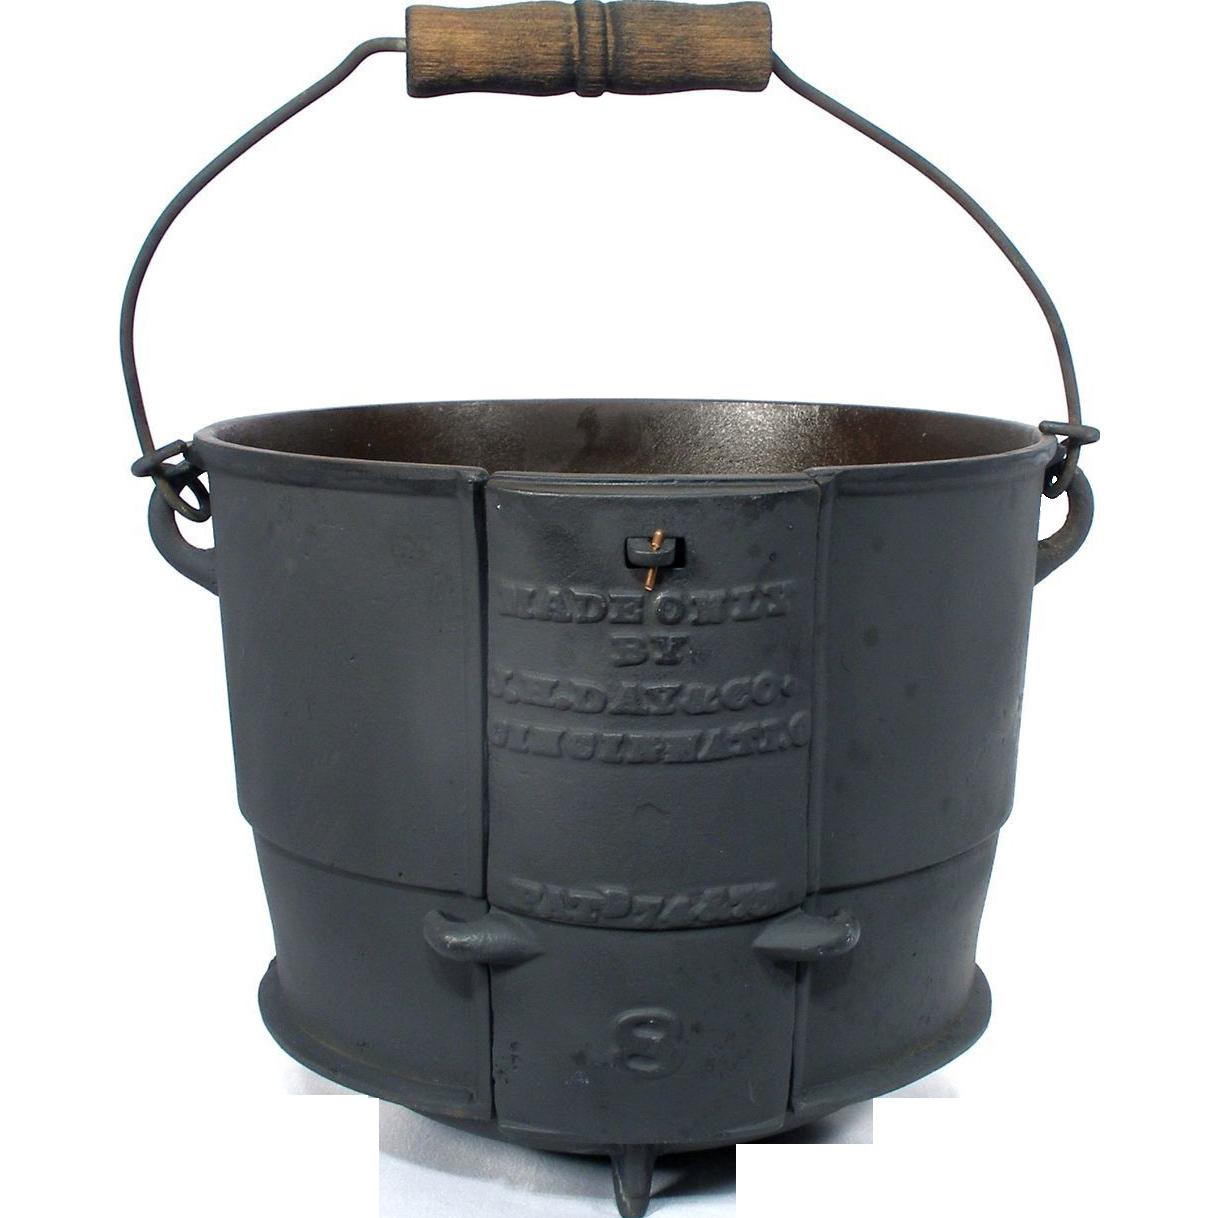 Antique J H Day Cast Iron 2 Gal Kettle Bail Handle Bean Camp Fire Safety Safe Pot